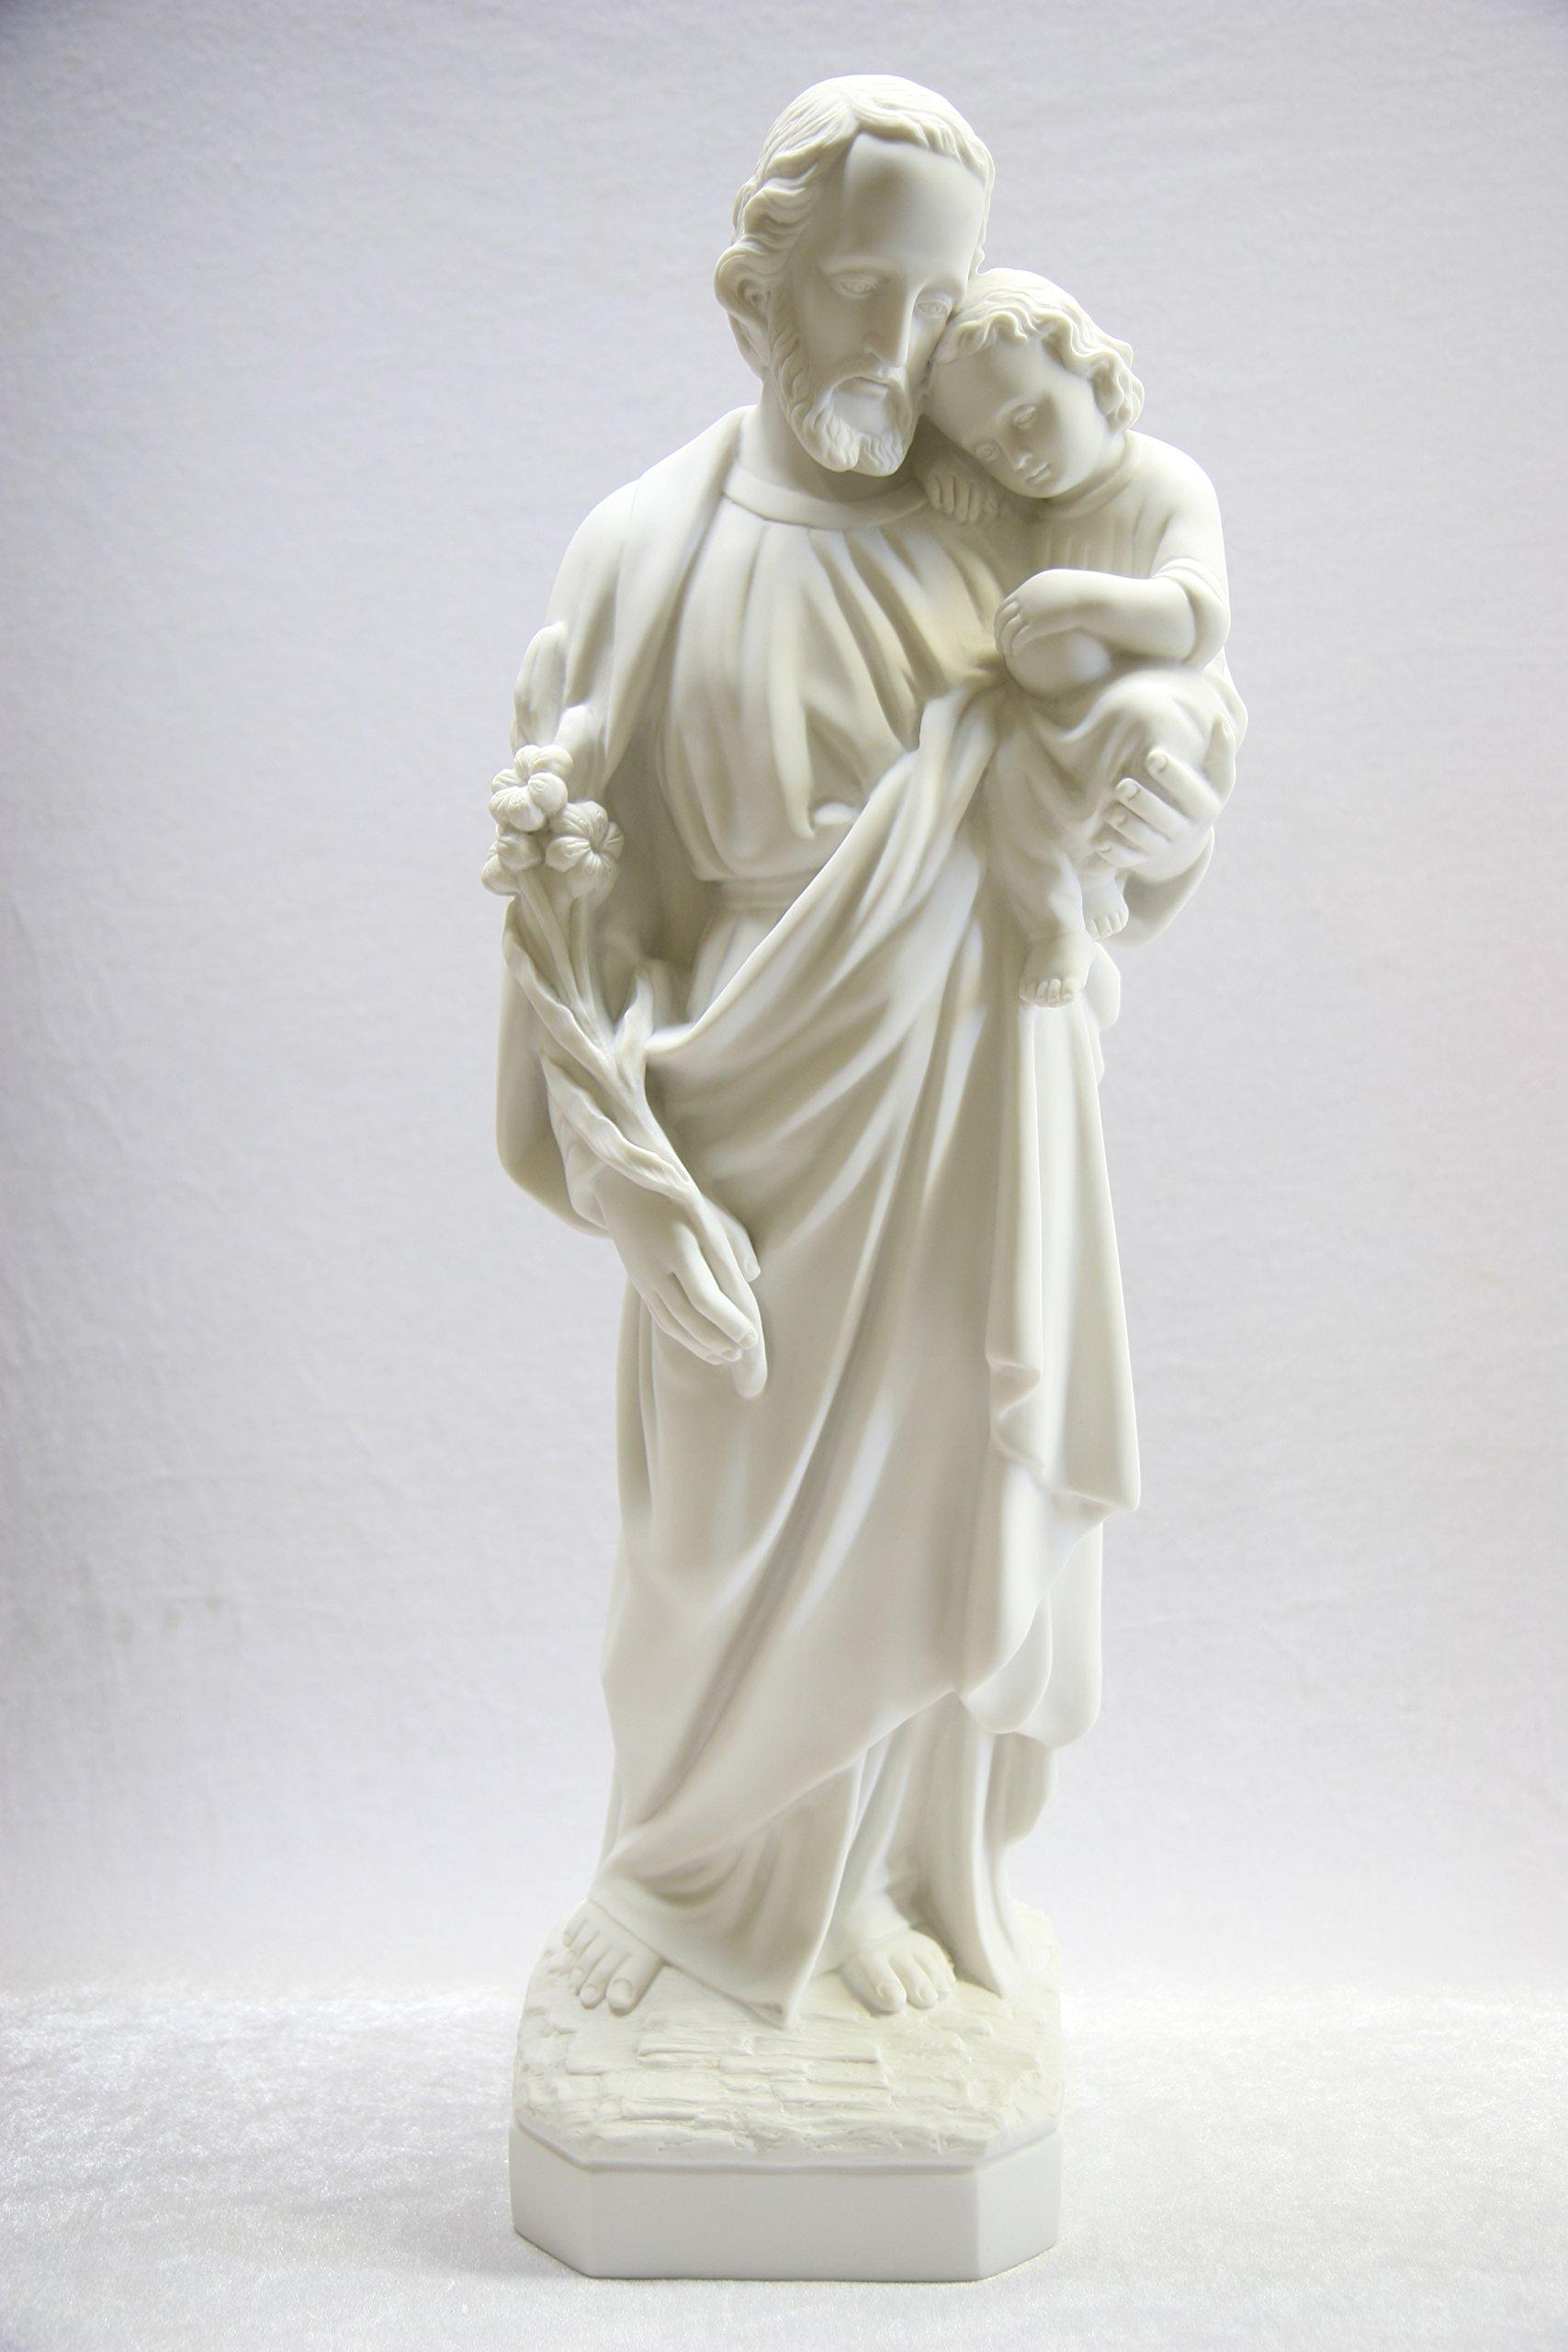 23 1/2'' Saint Joseph with Jesus Baby Holy Child Catholic Statue Sculpture Figurine Religious